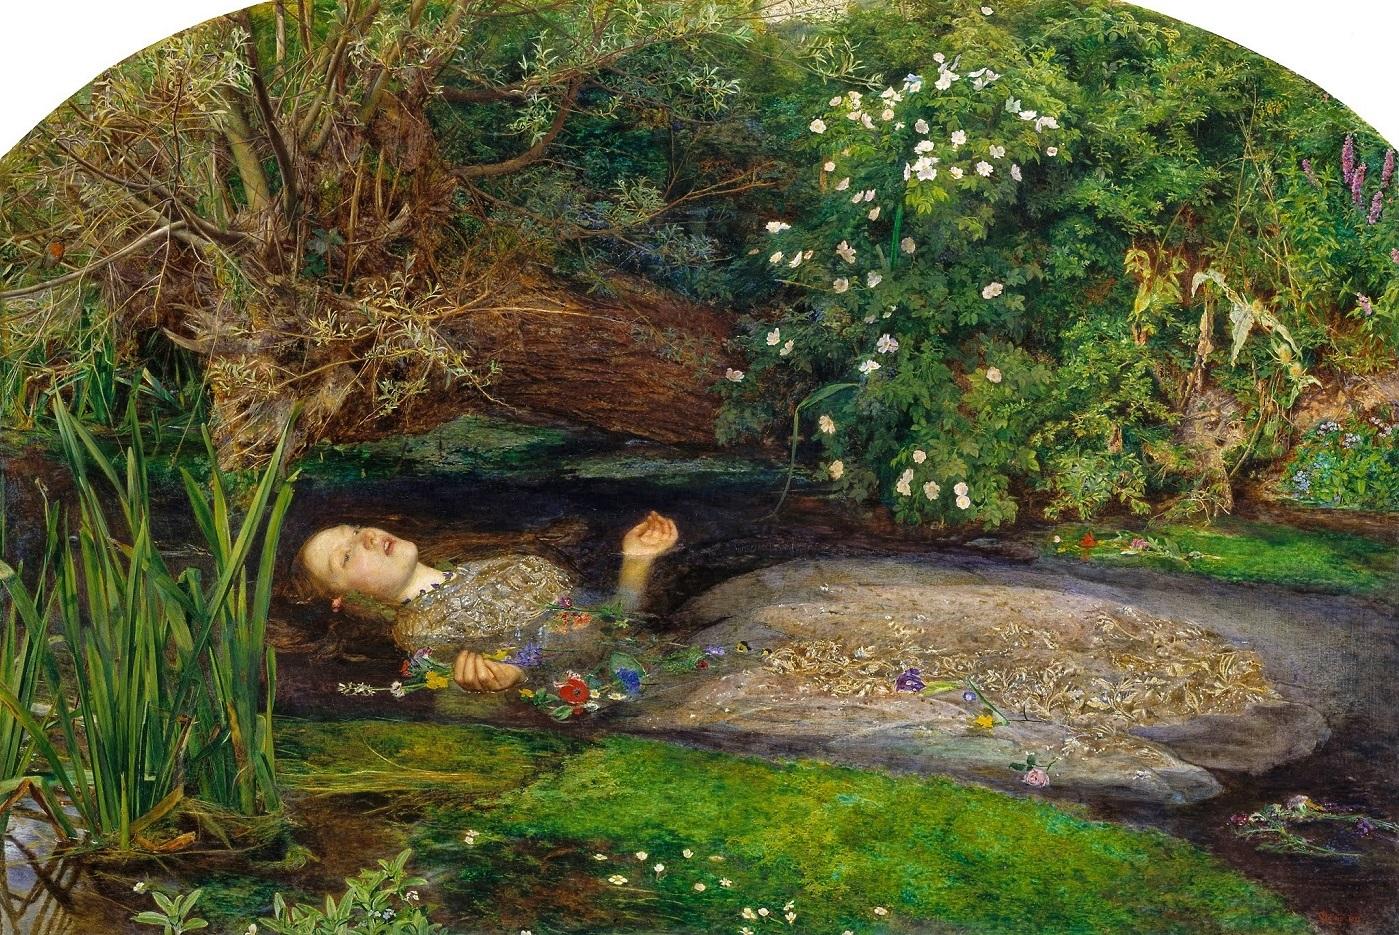 John_Everett_Millais_-_Ophelia_-_Google_Art_Project (1).jpg